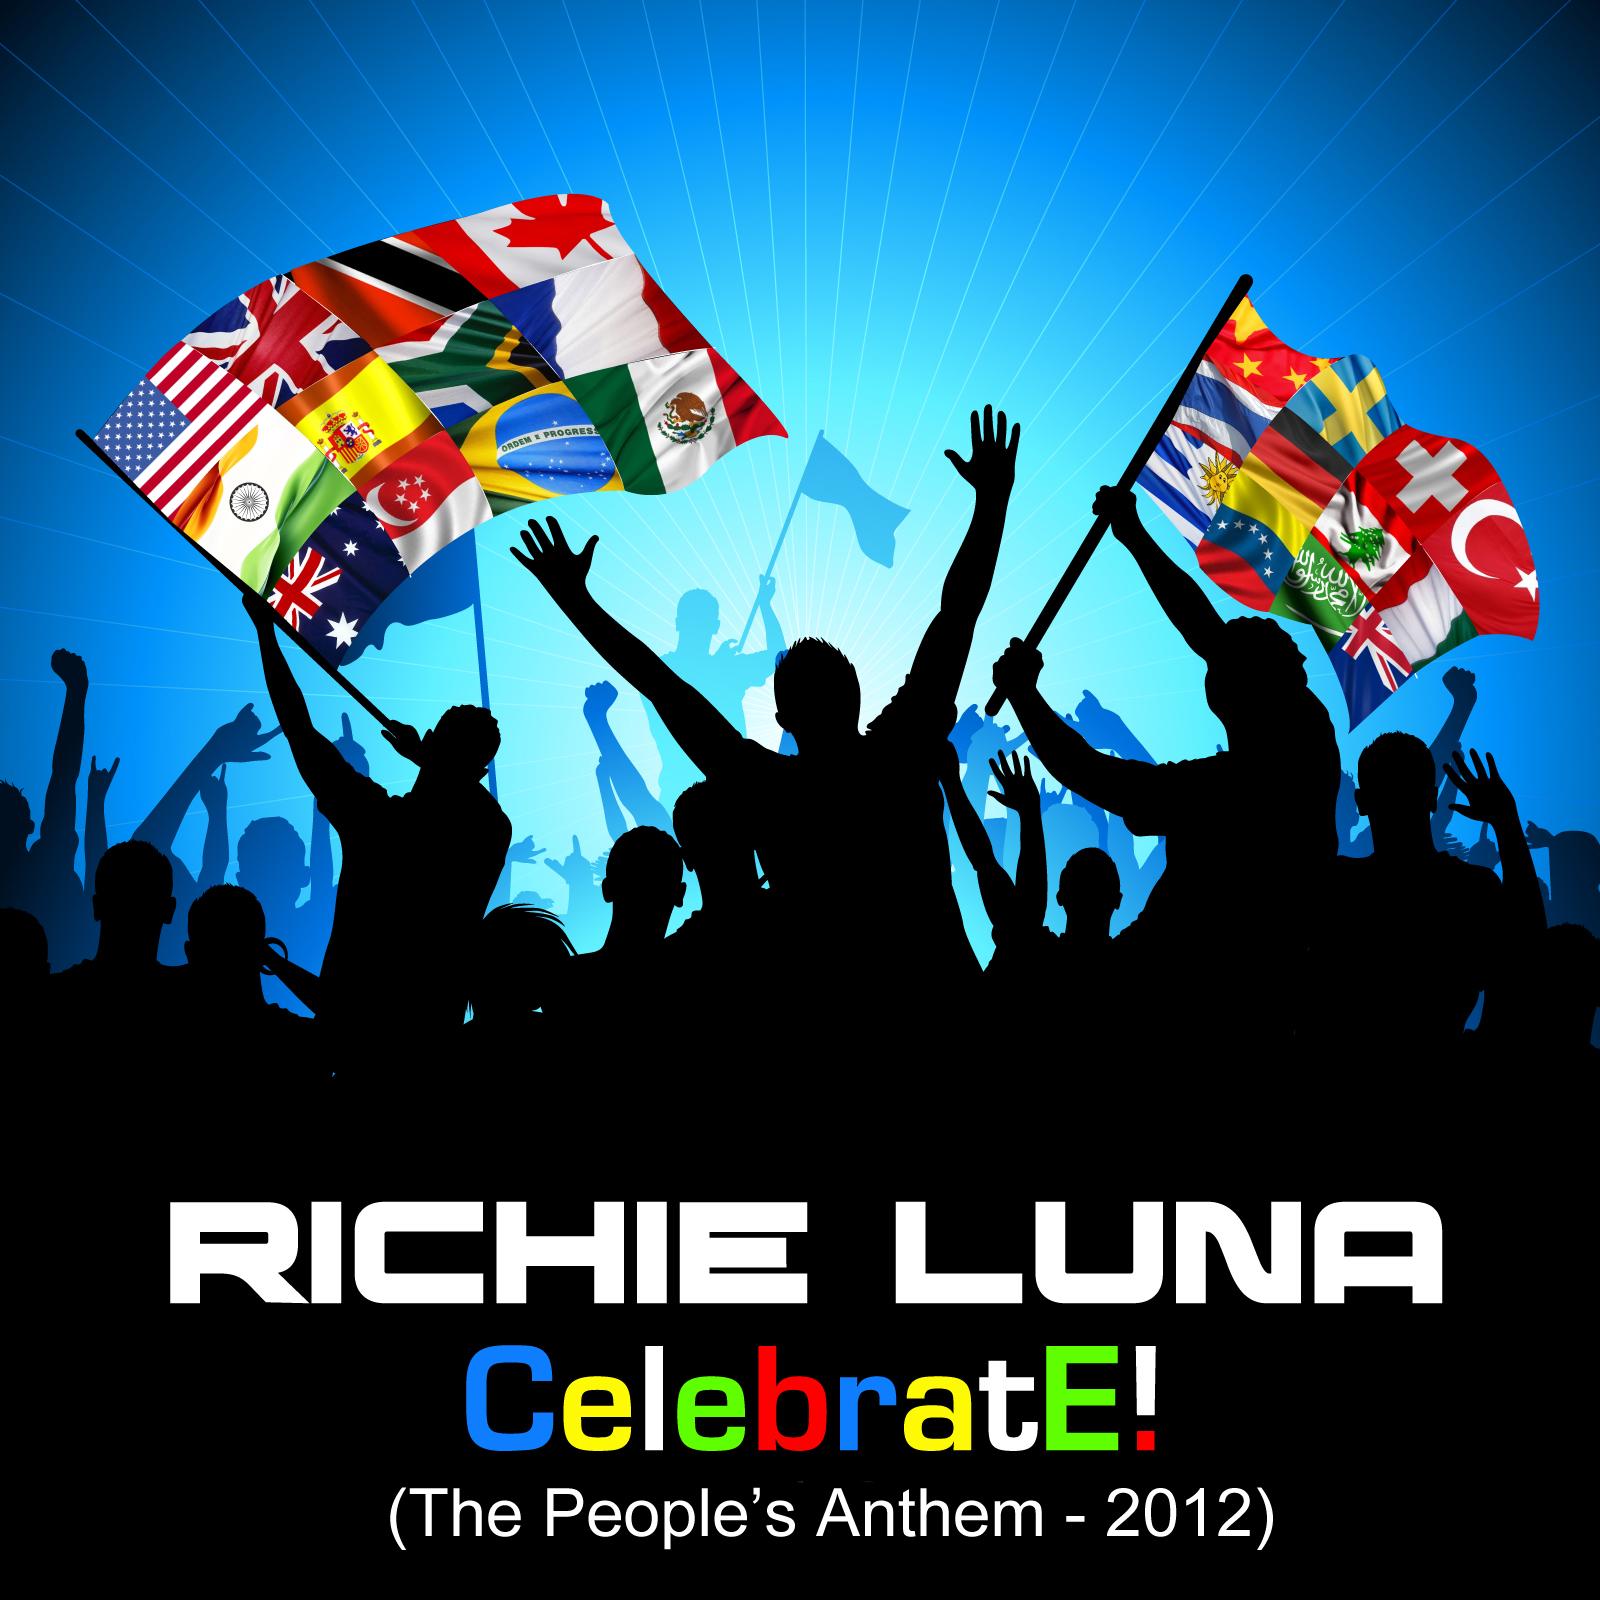 Richie Luna -Celebrate - The People's Anthem